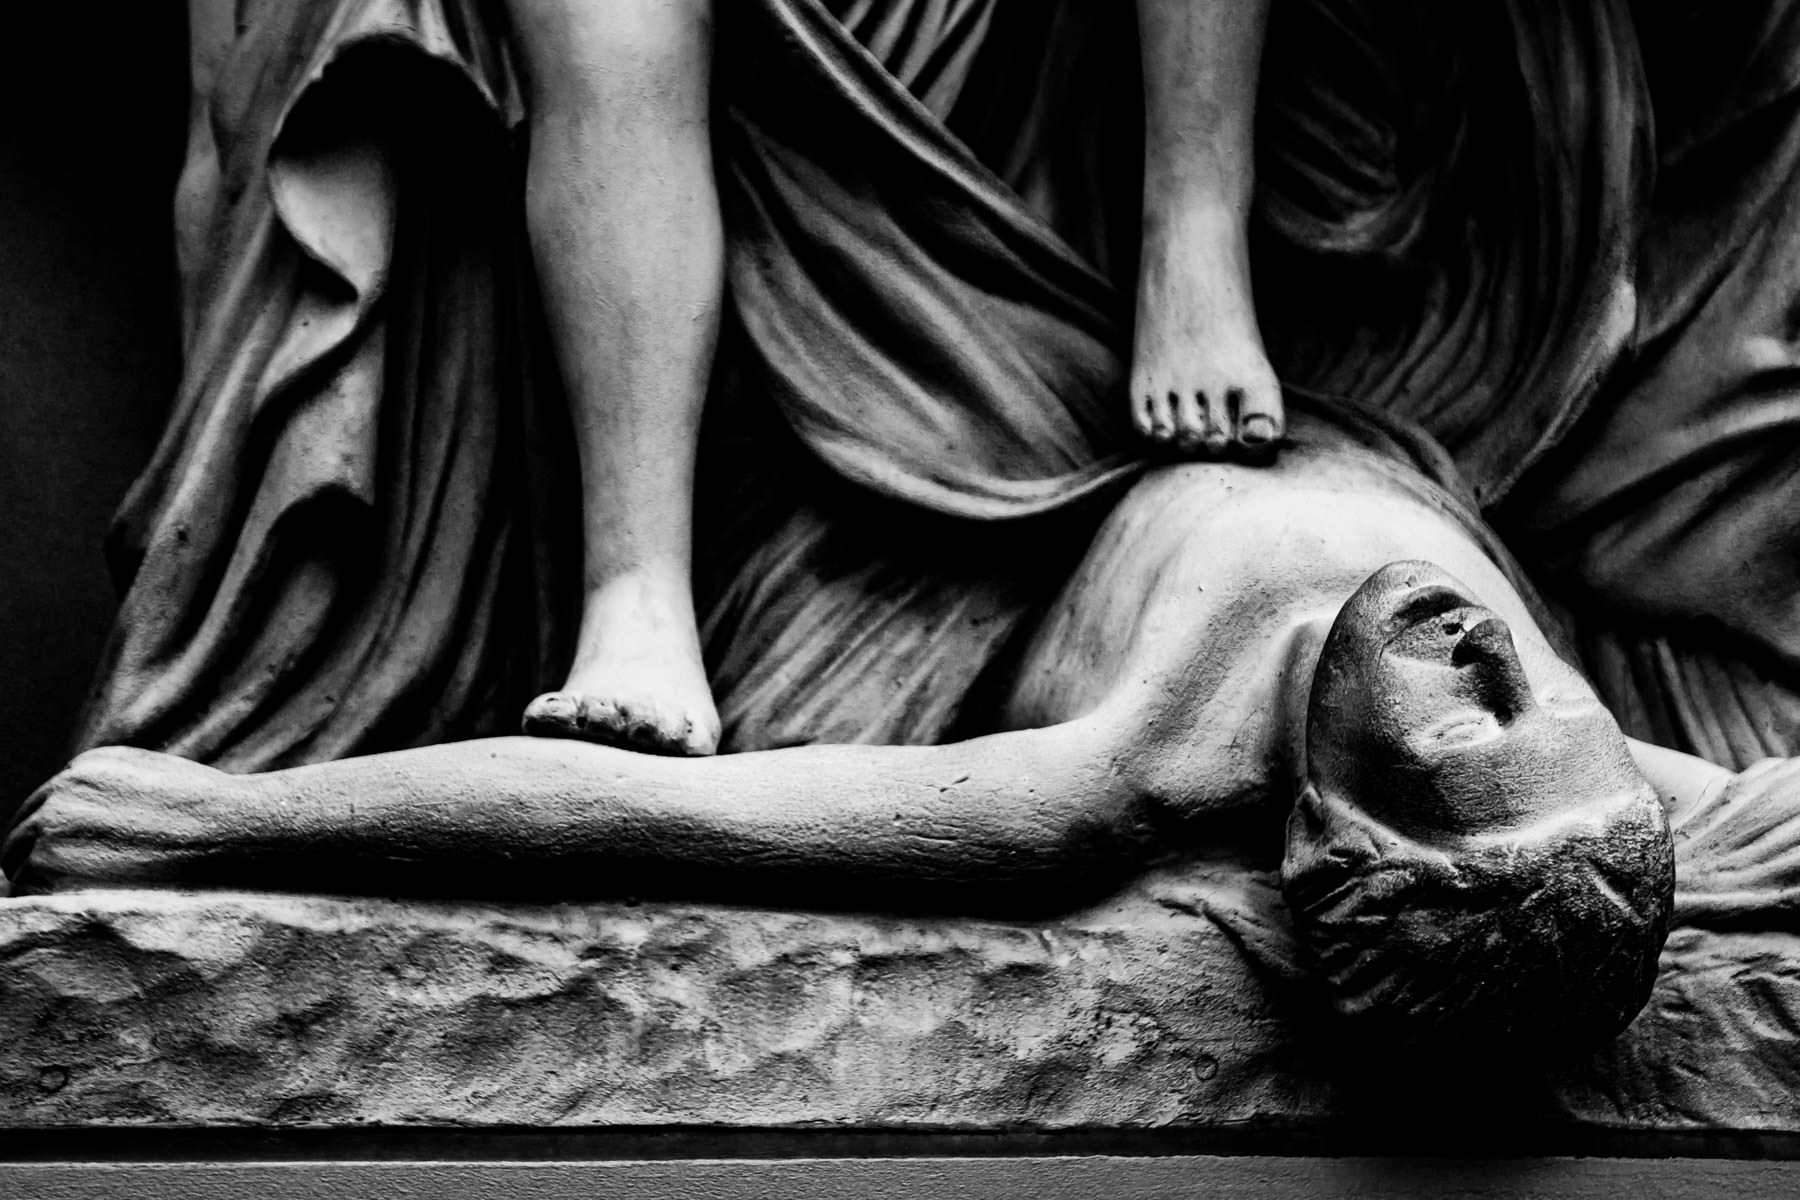 Detail of statues at Paris Hotel & Casino, Las Vegas.